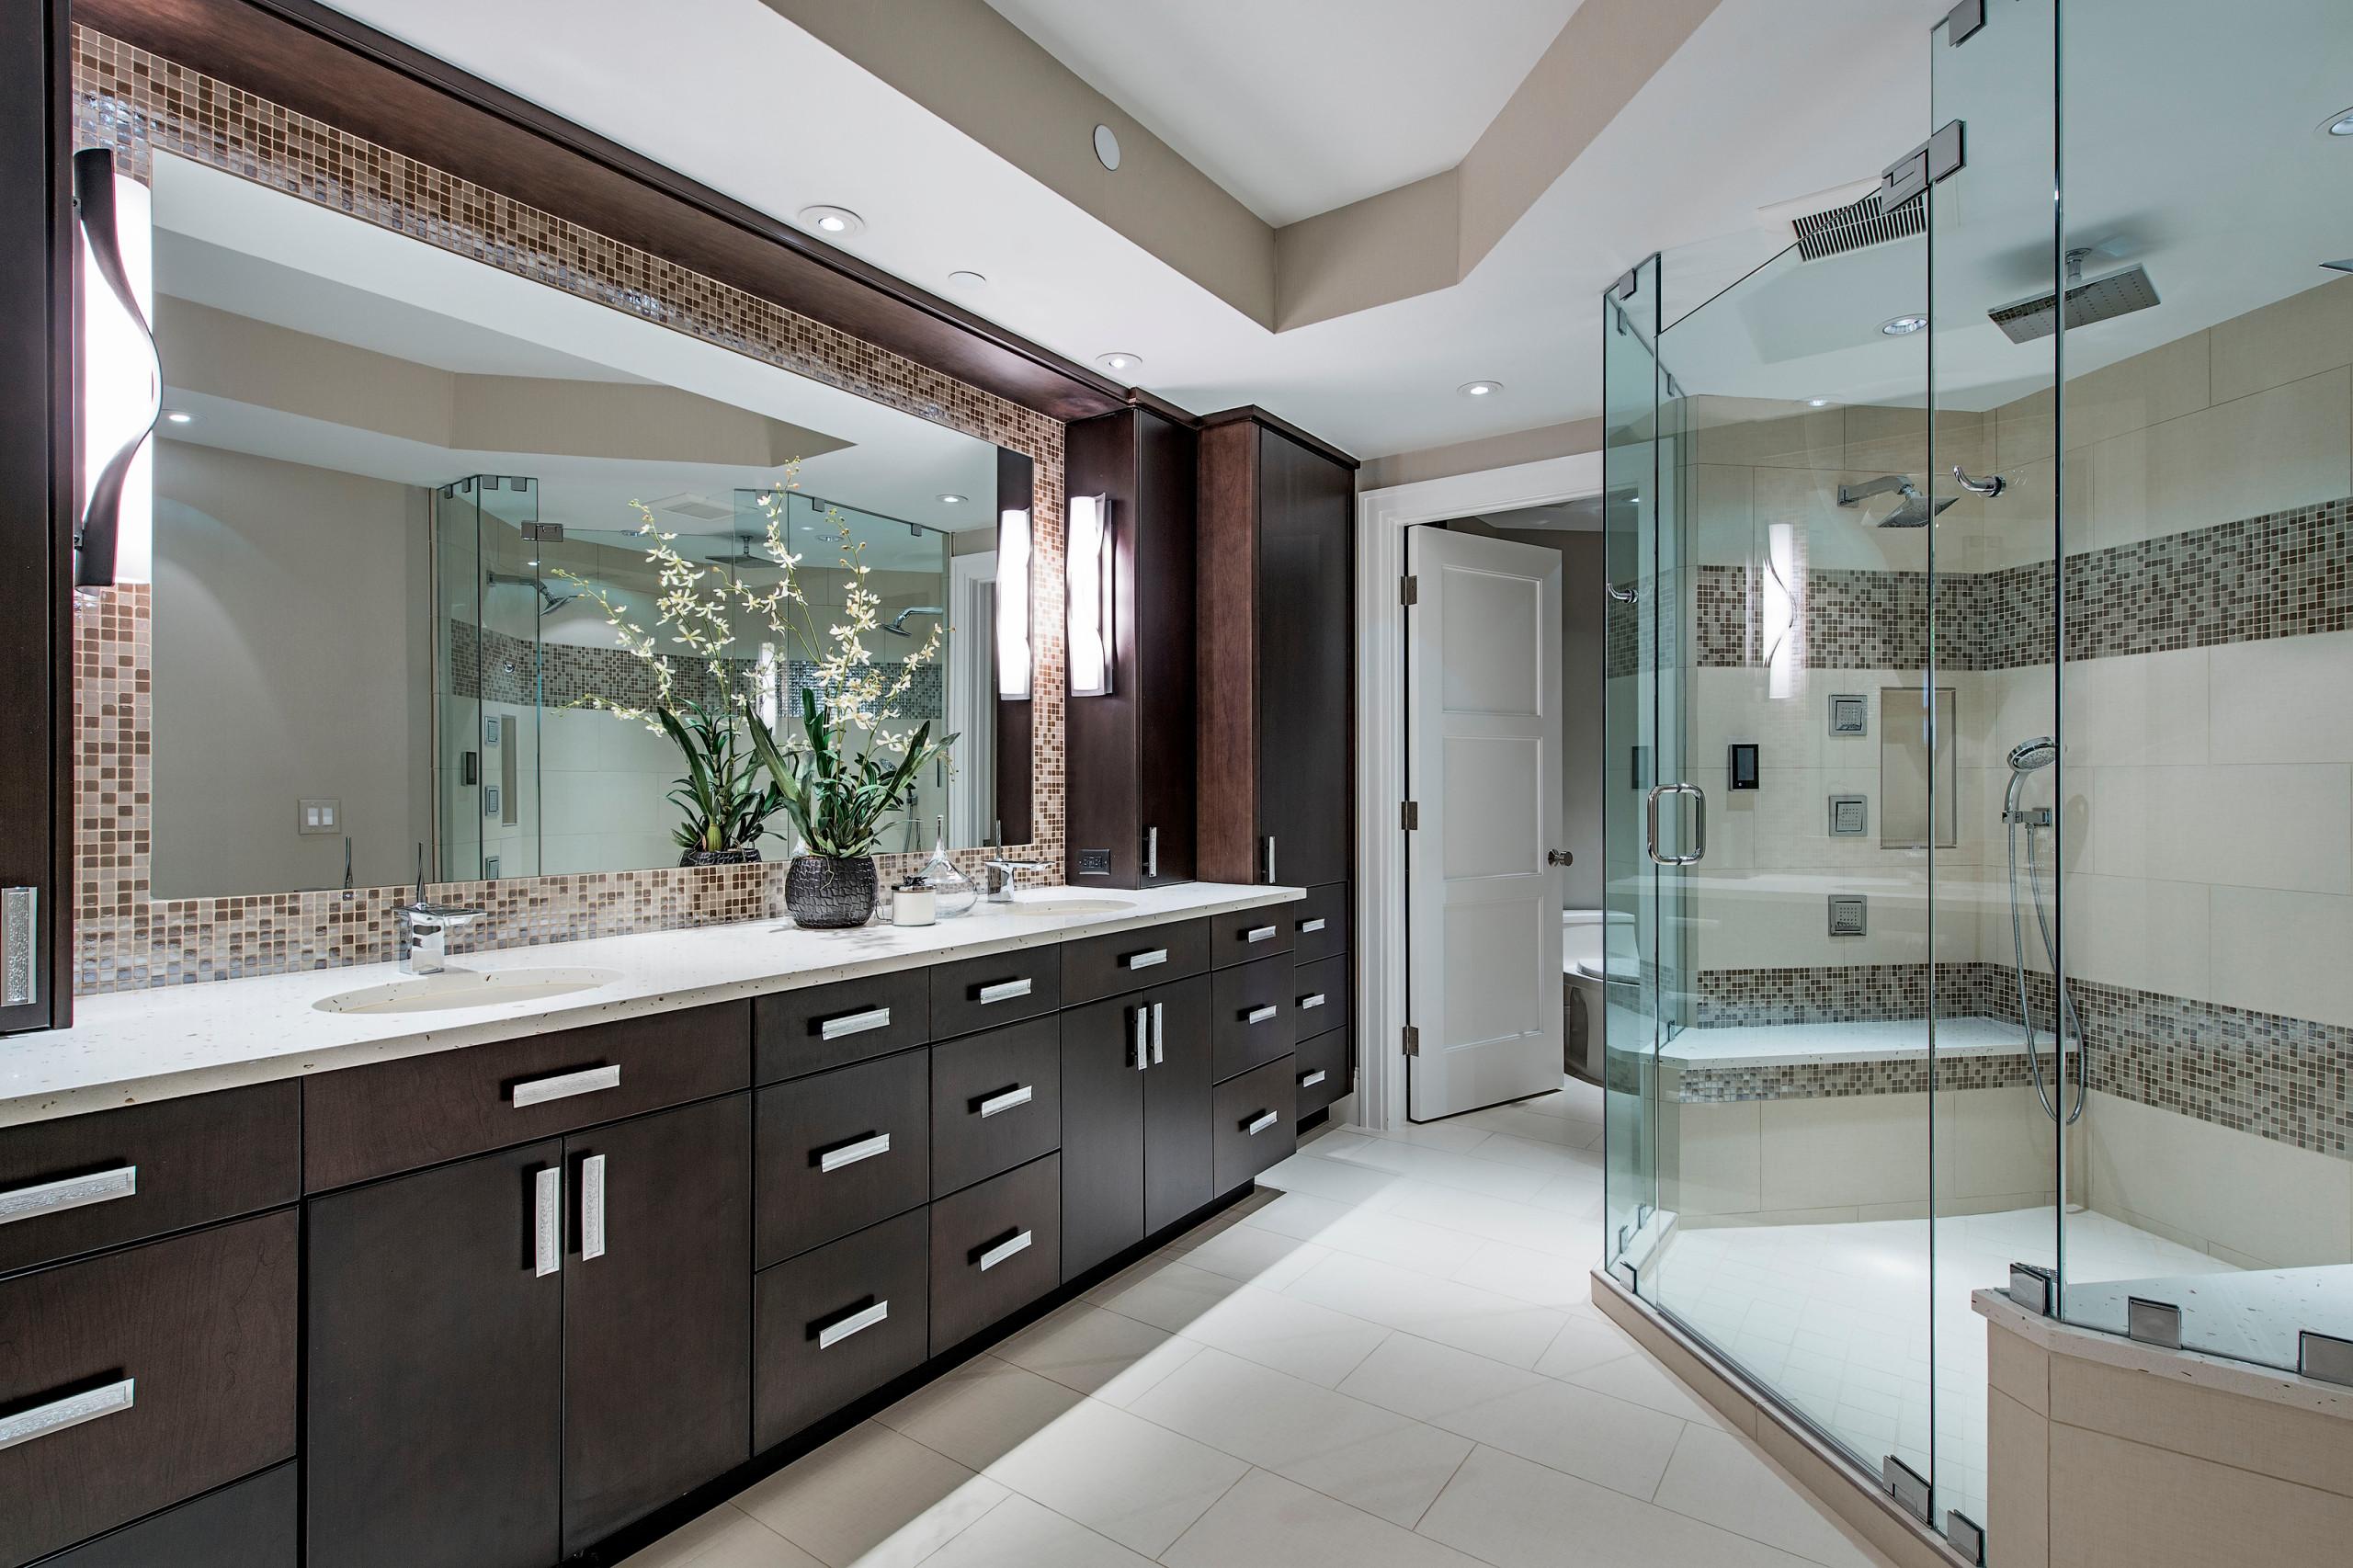 Certified Luxury Builders - 41 West - St. Raphael Condo Remodel